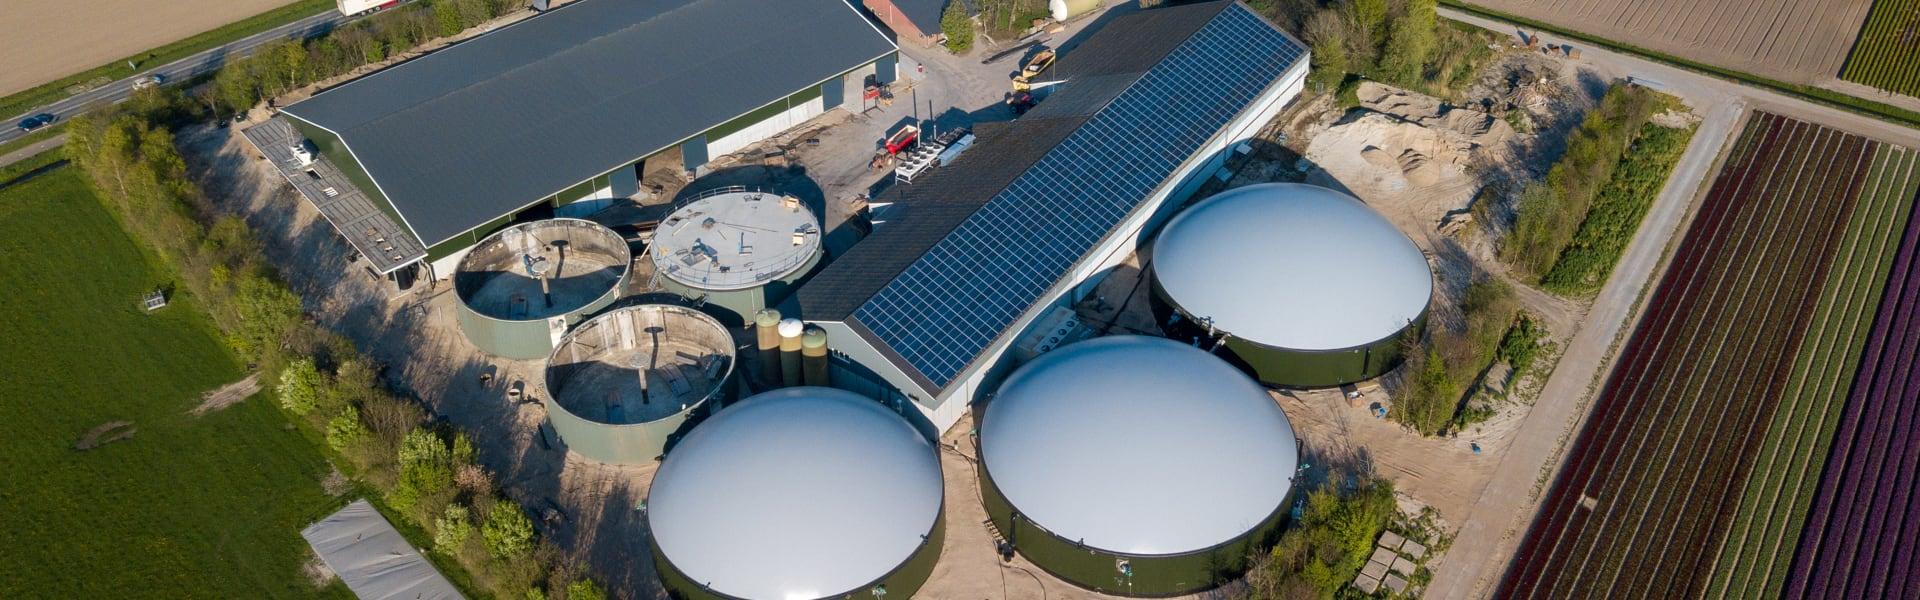 Opinie: Omarm de huidige groen gas ondernemers